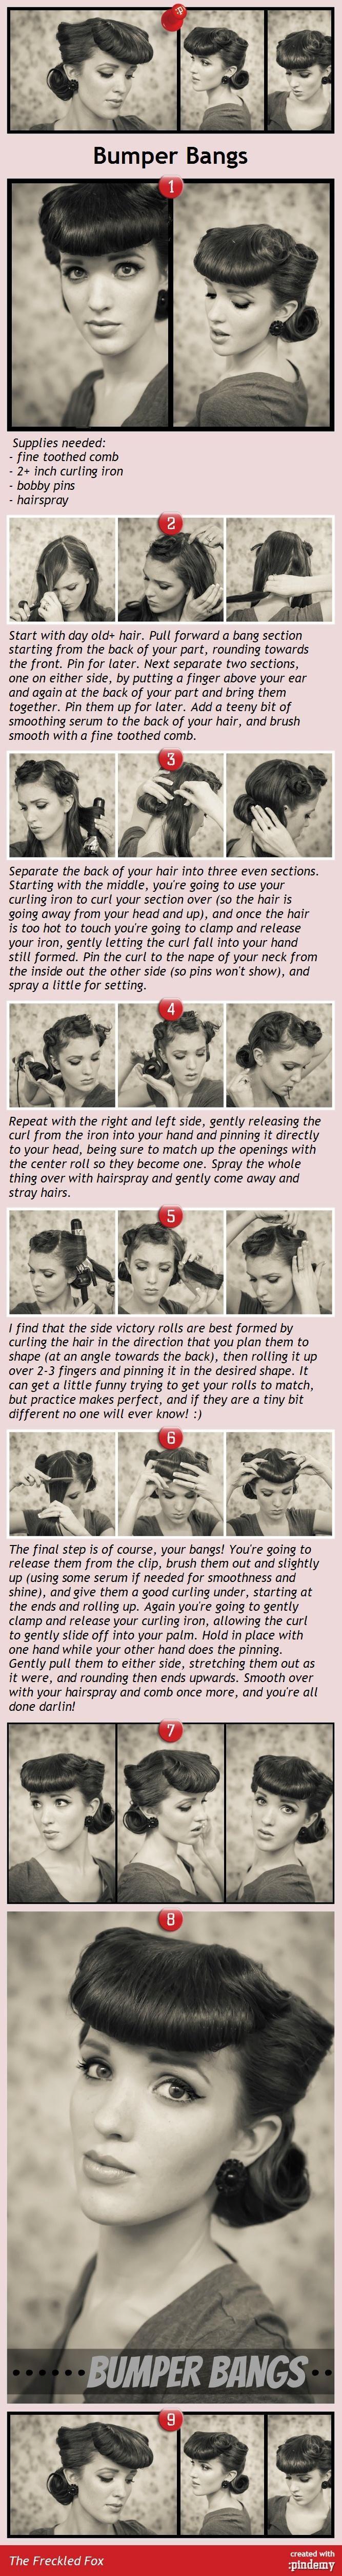 Beauty Tip: DIY Hair / Bumper Bangs tutorial - Fereckels